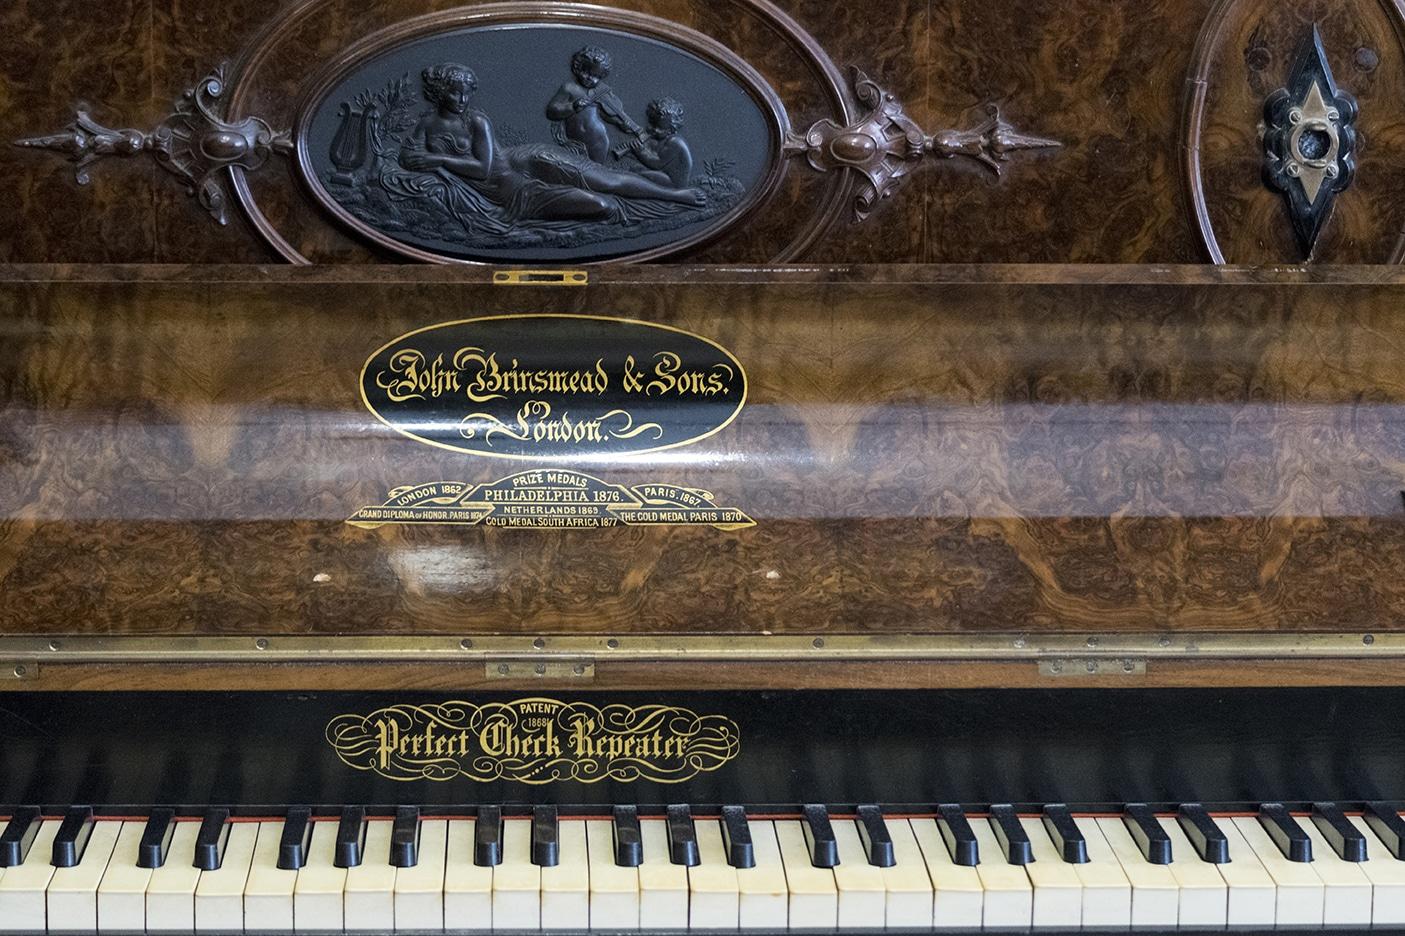 Restauration de pianos anciens